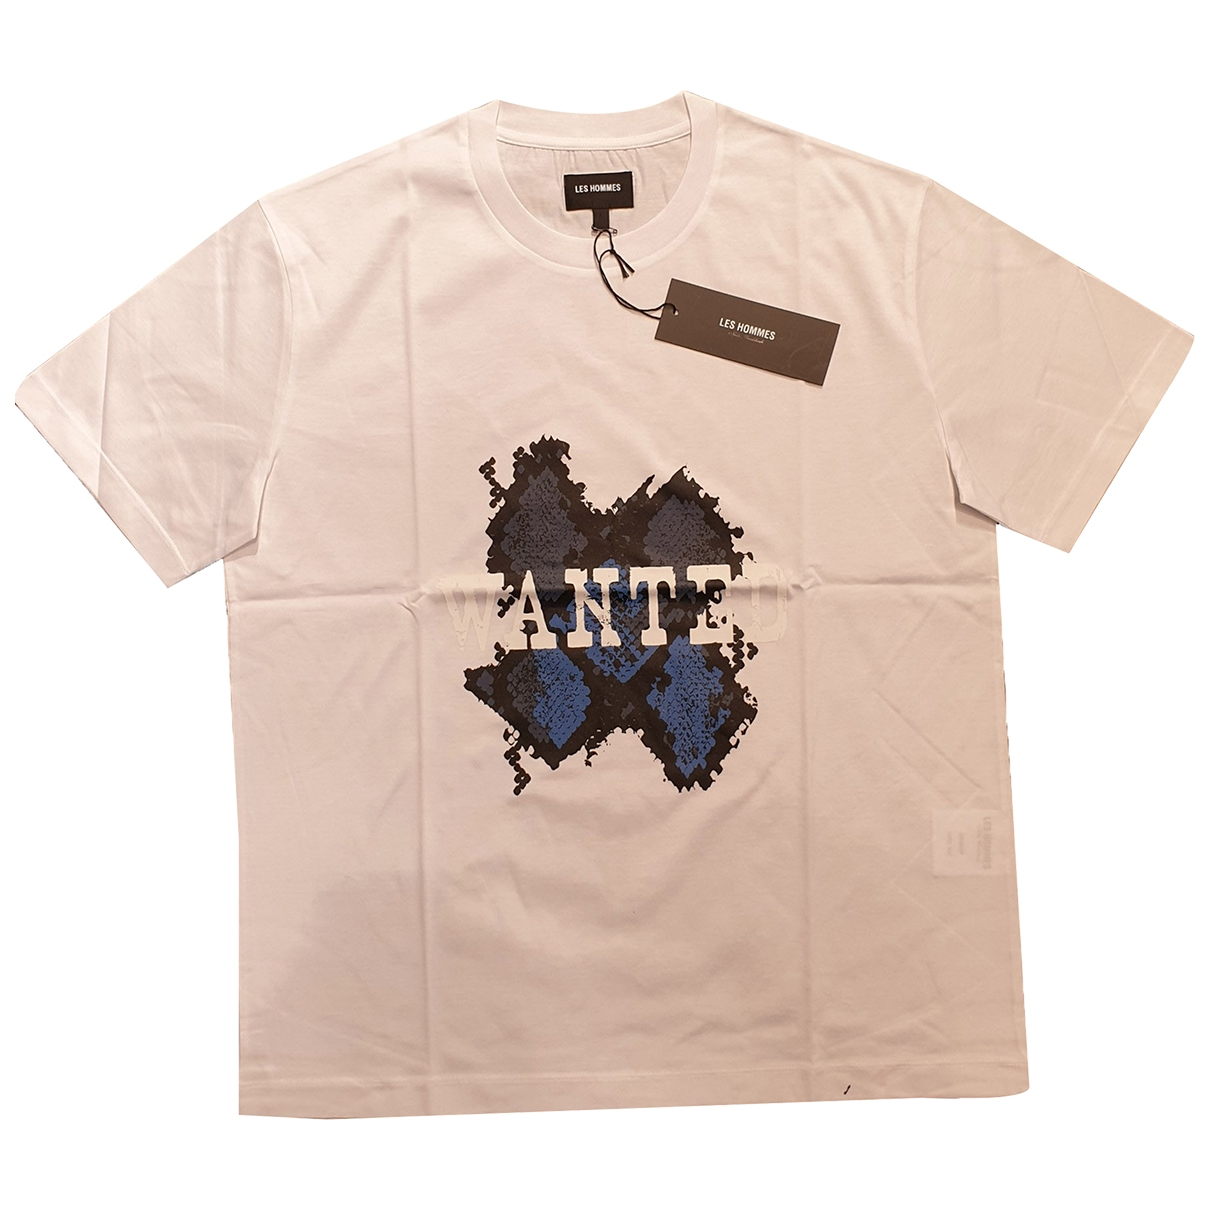 Les Hommes \N White Cotton T-shirts for Men L International